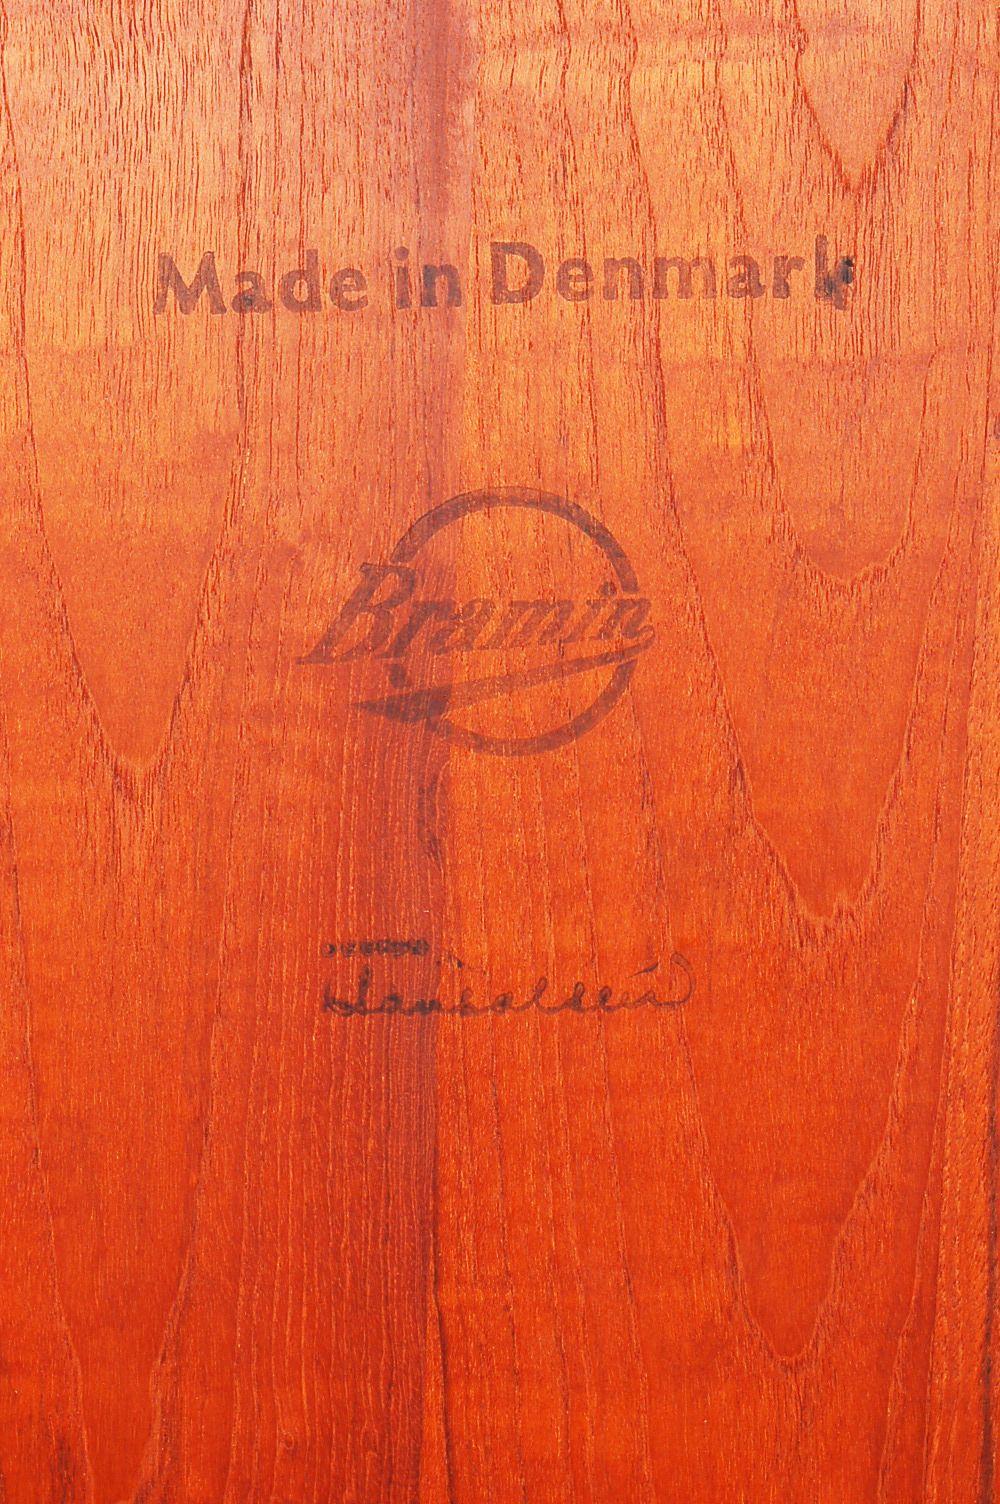 Pin By Teegeebee Mid Century On Mid Century And Danish Modern Signatures Danish Modern Design Mid Century Furniture Furniture Maker